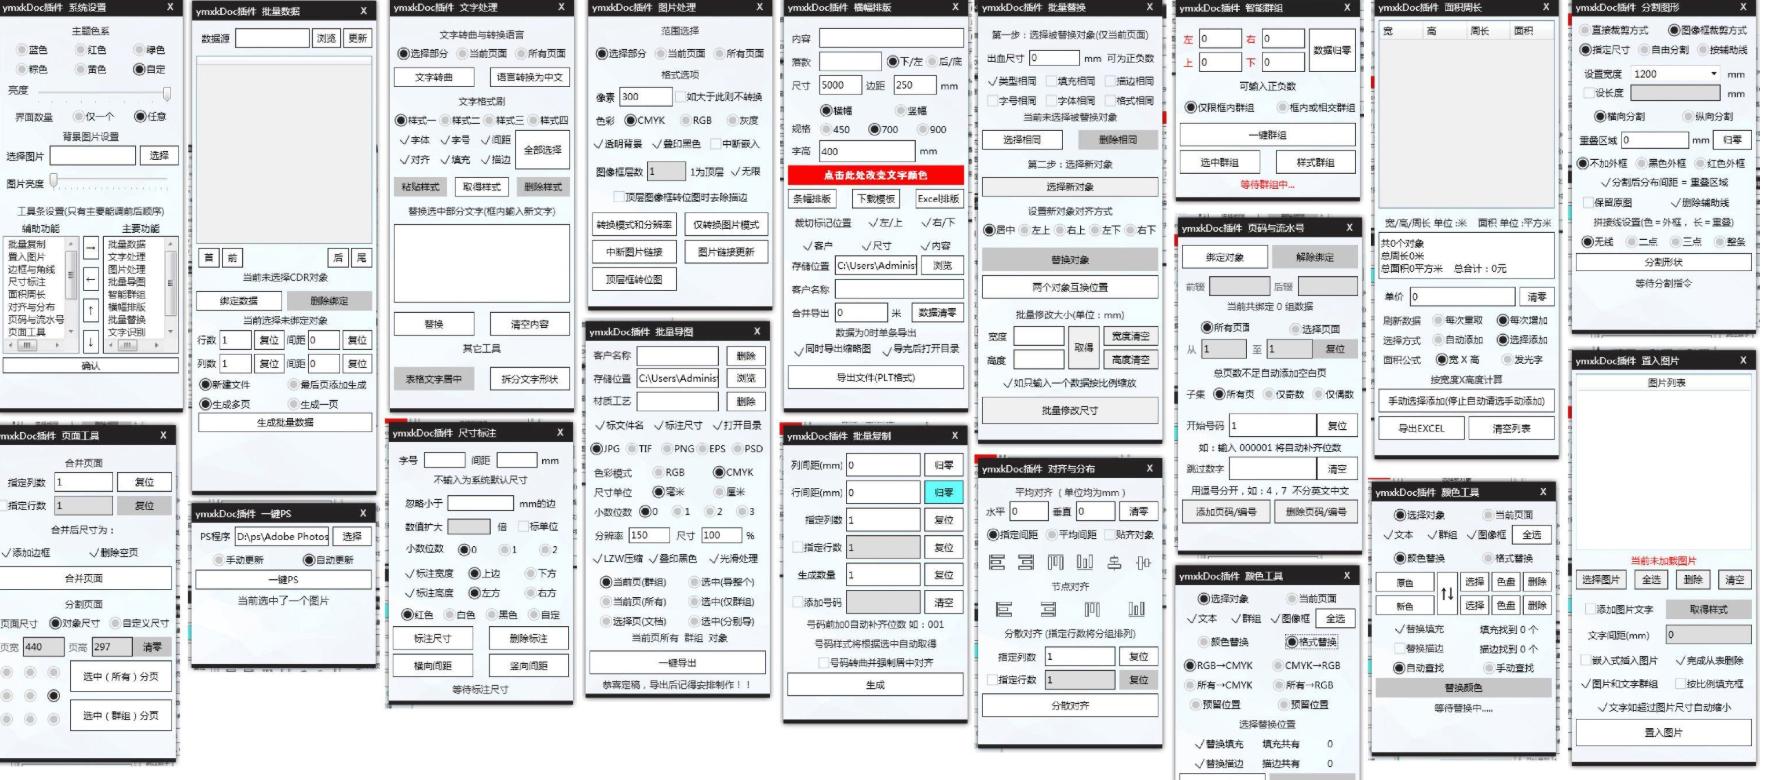 CDR ymxkDoc插件 支持X7-2020到以后版-狗破解-Go破解 GoPoJie.COM